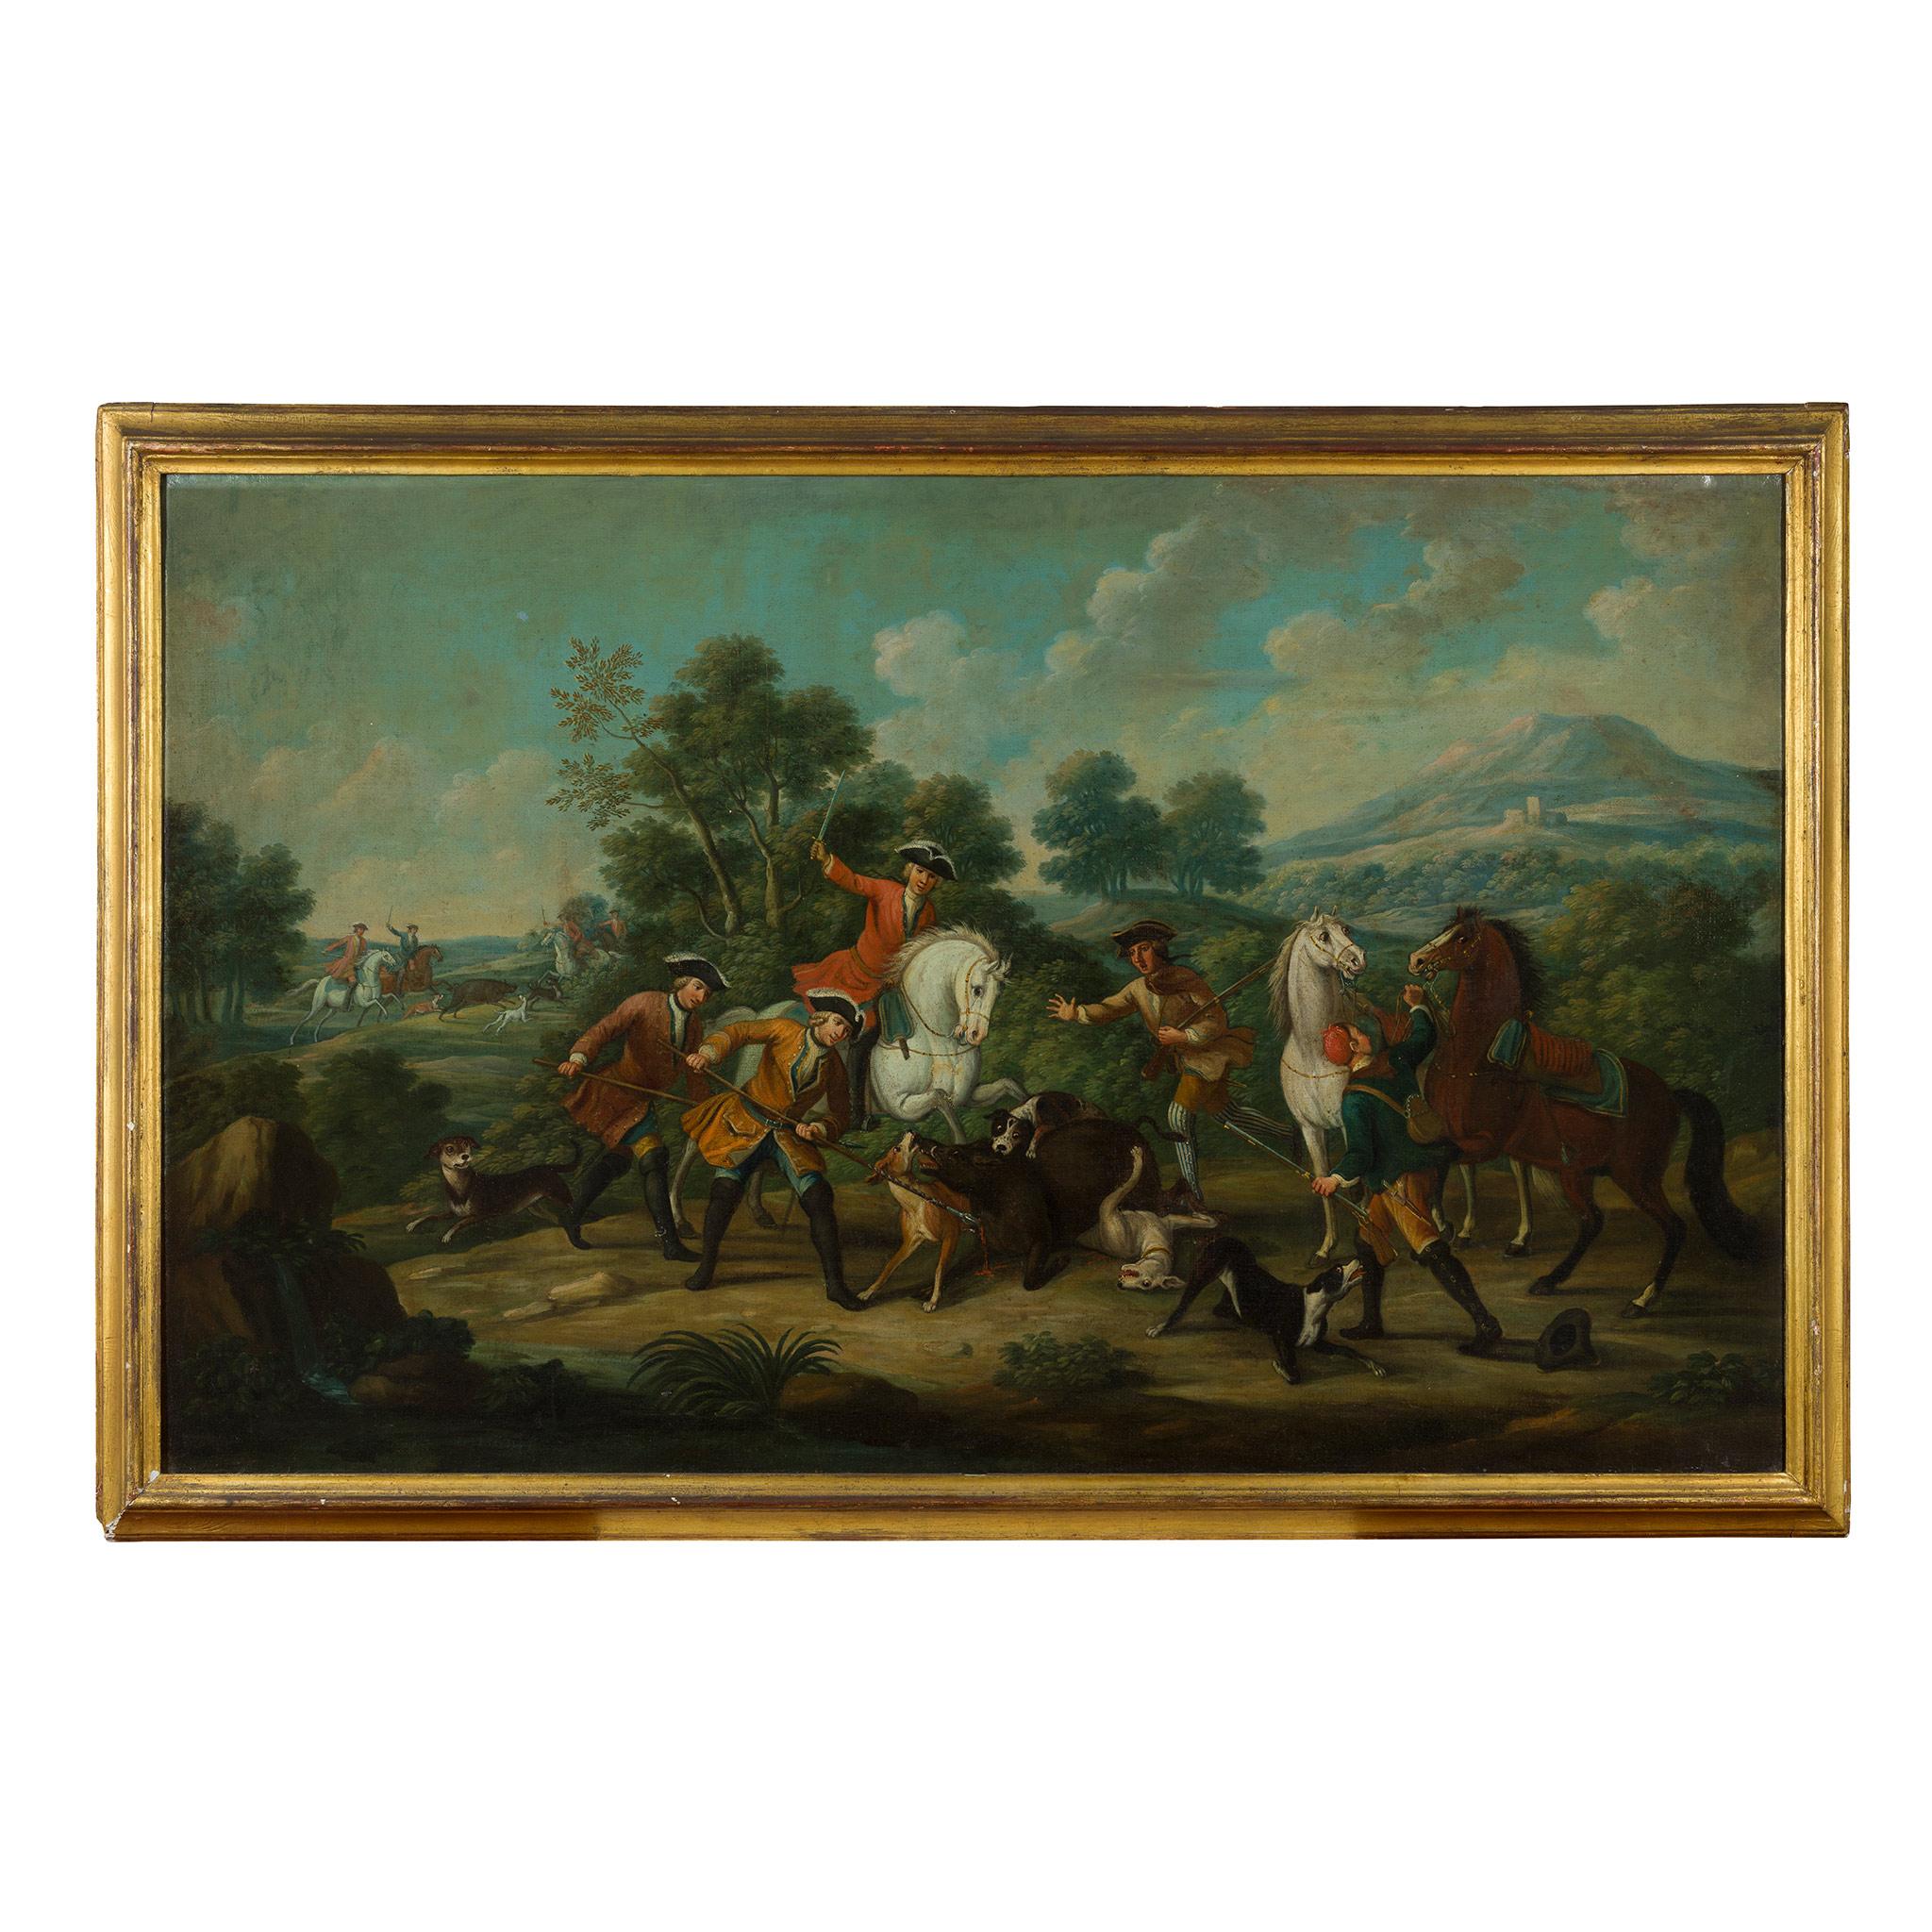 18TH CENTURY FRENCH SCHOOL ELEGANT FIGURES BOAR HUNTING - Image 6 of 8